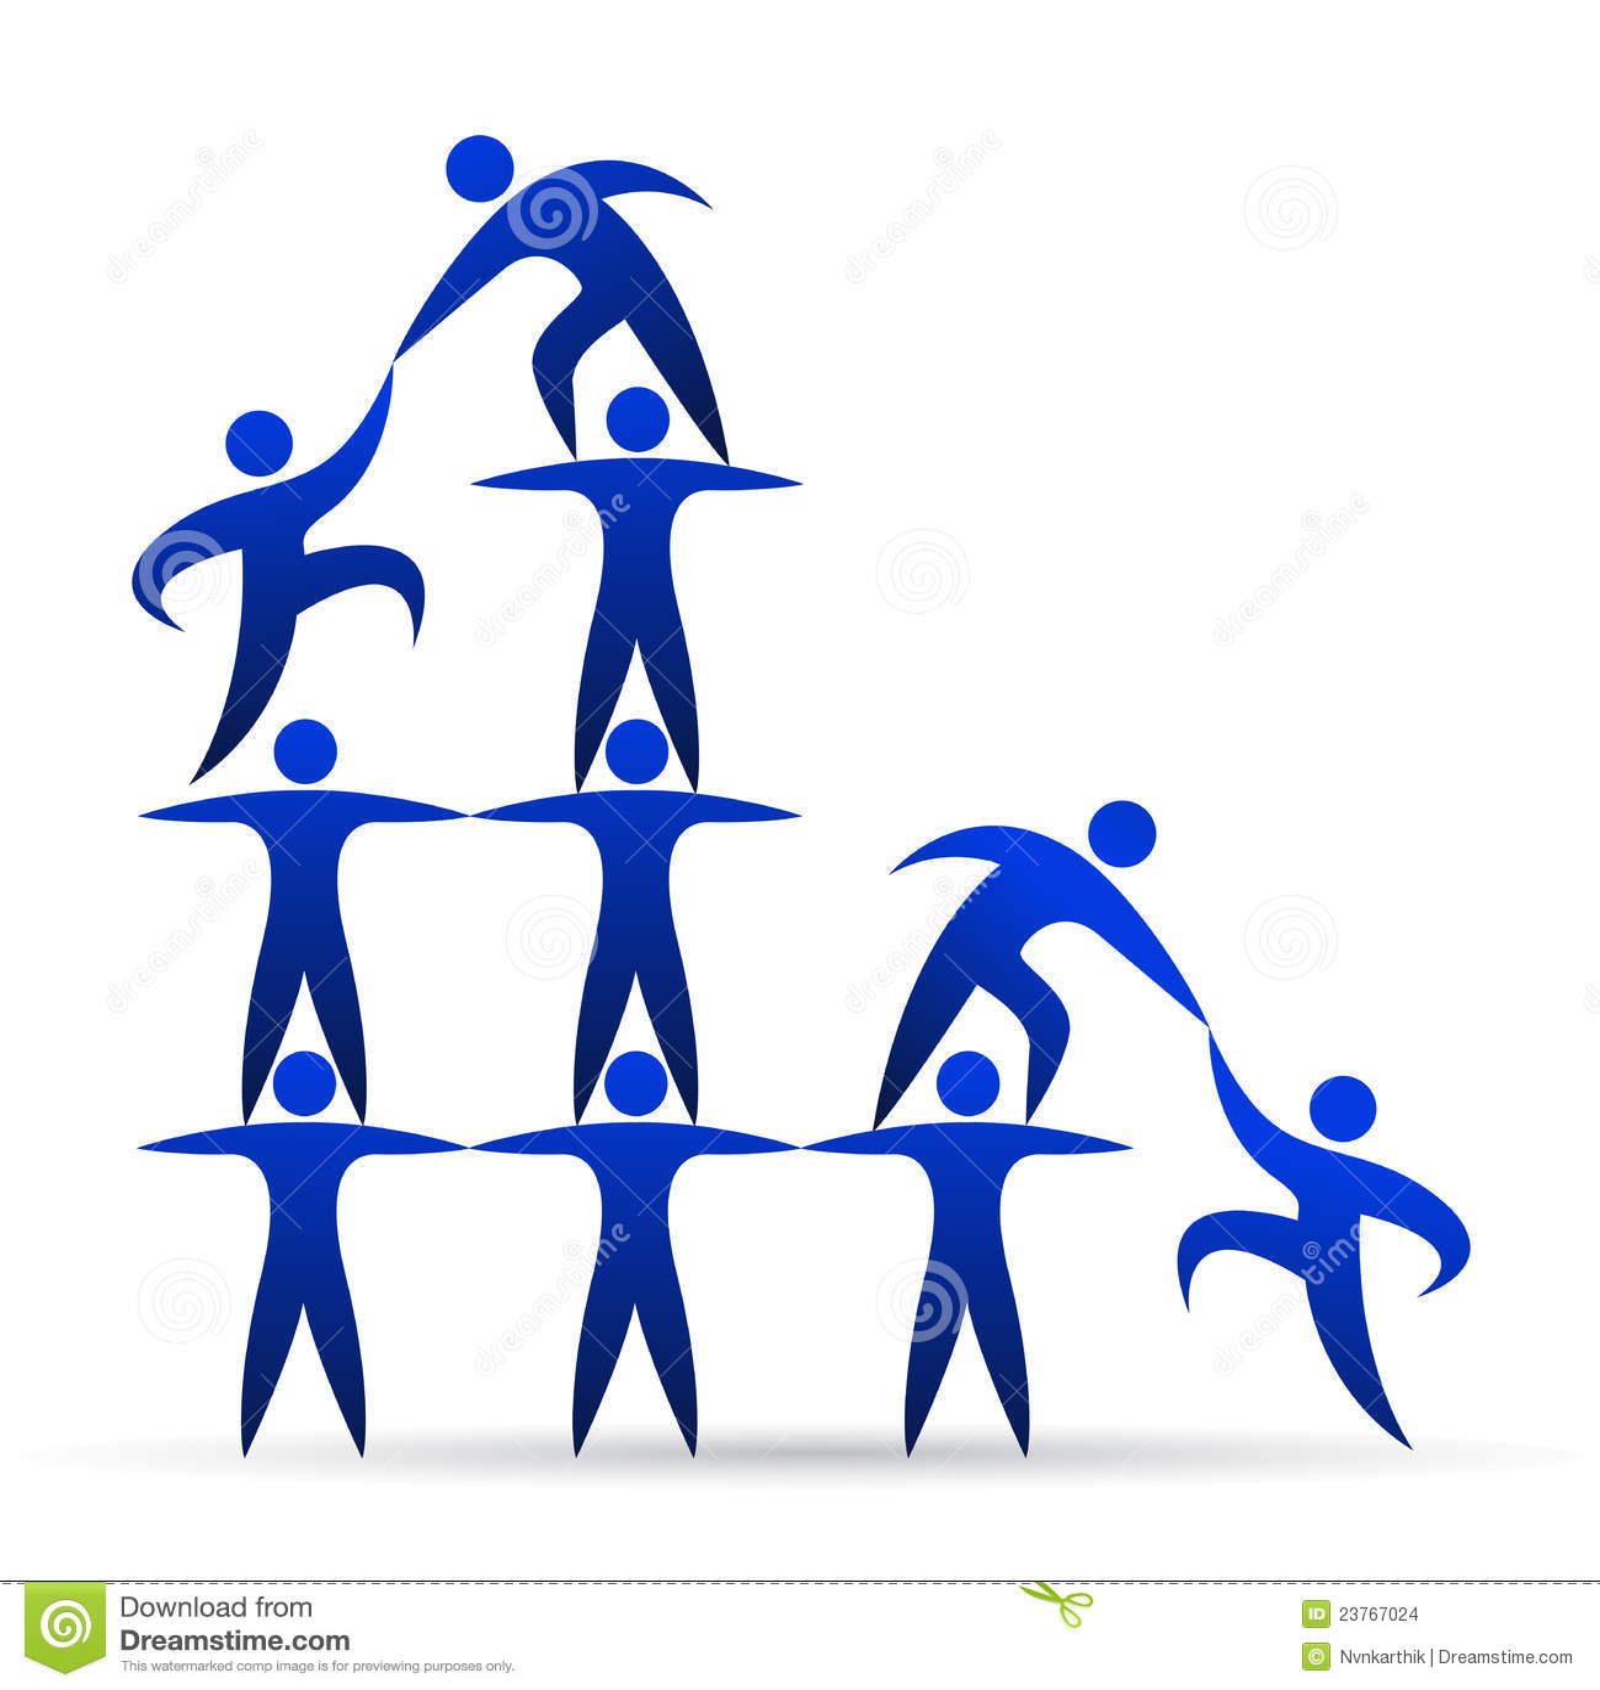 Building Teamwork Stock Images Image 23767024